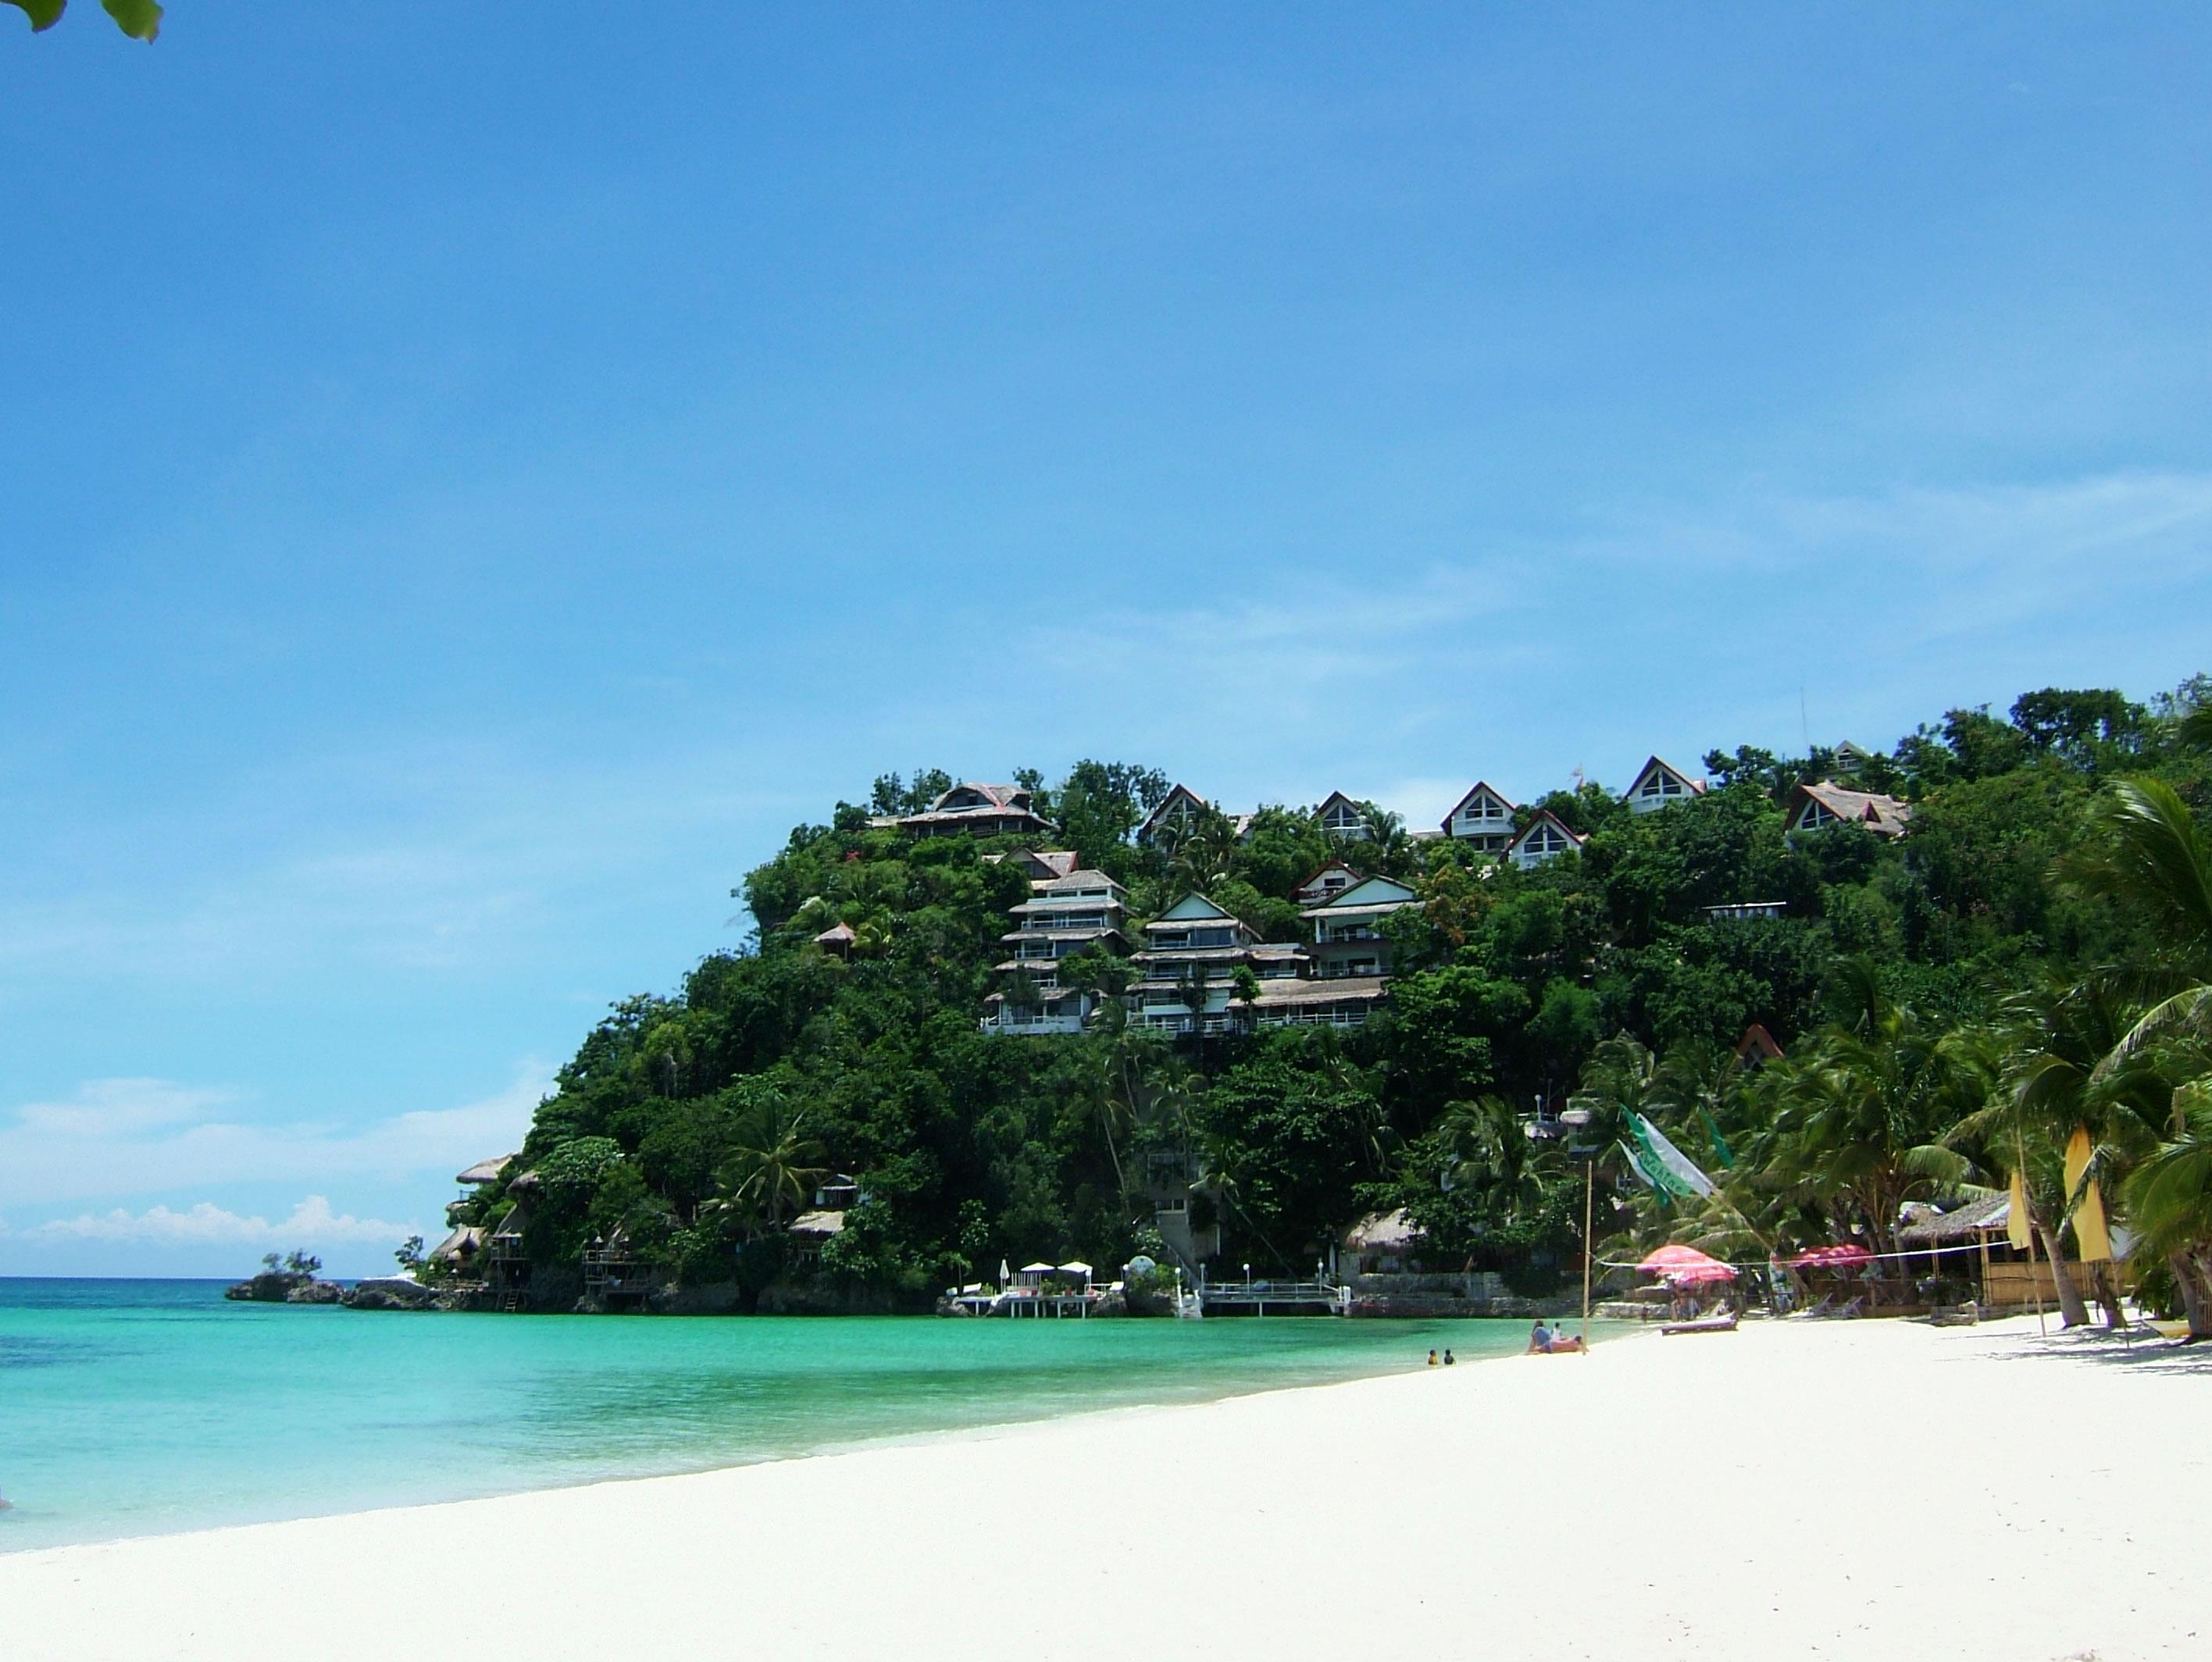 Philippines Sugar Islands Boracay Punta bunga beach Resorts 2007 13